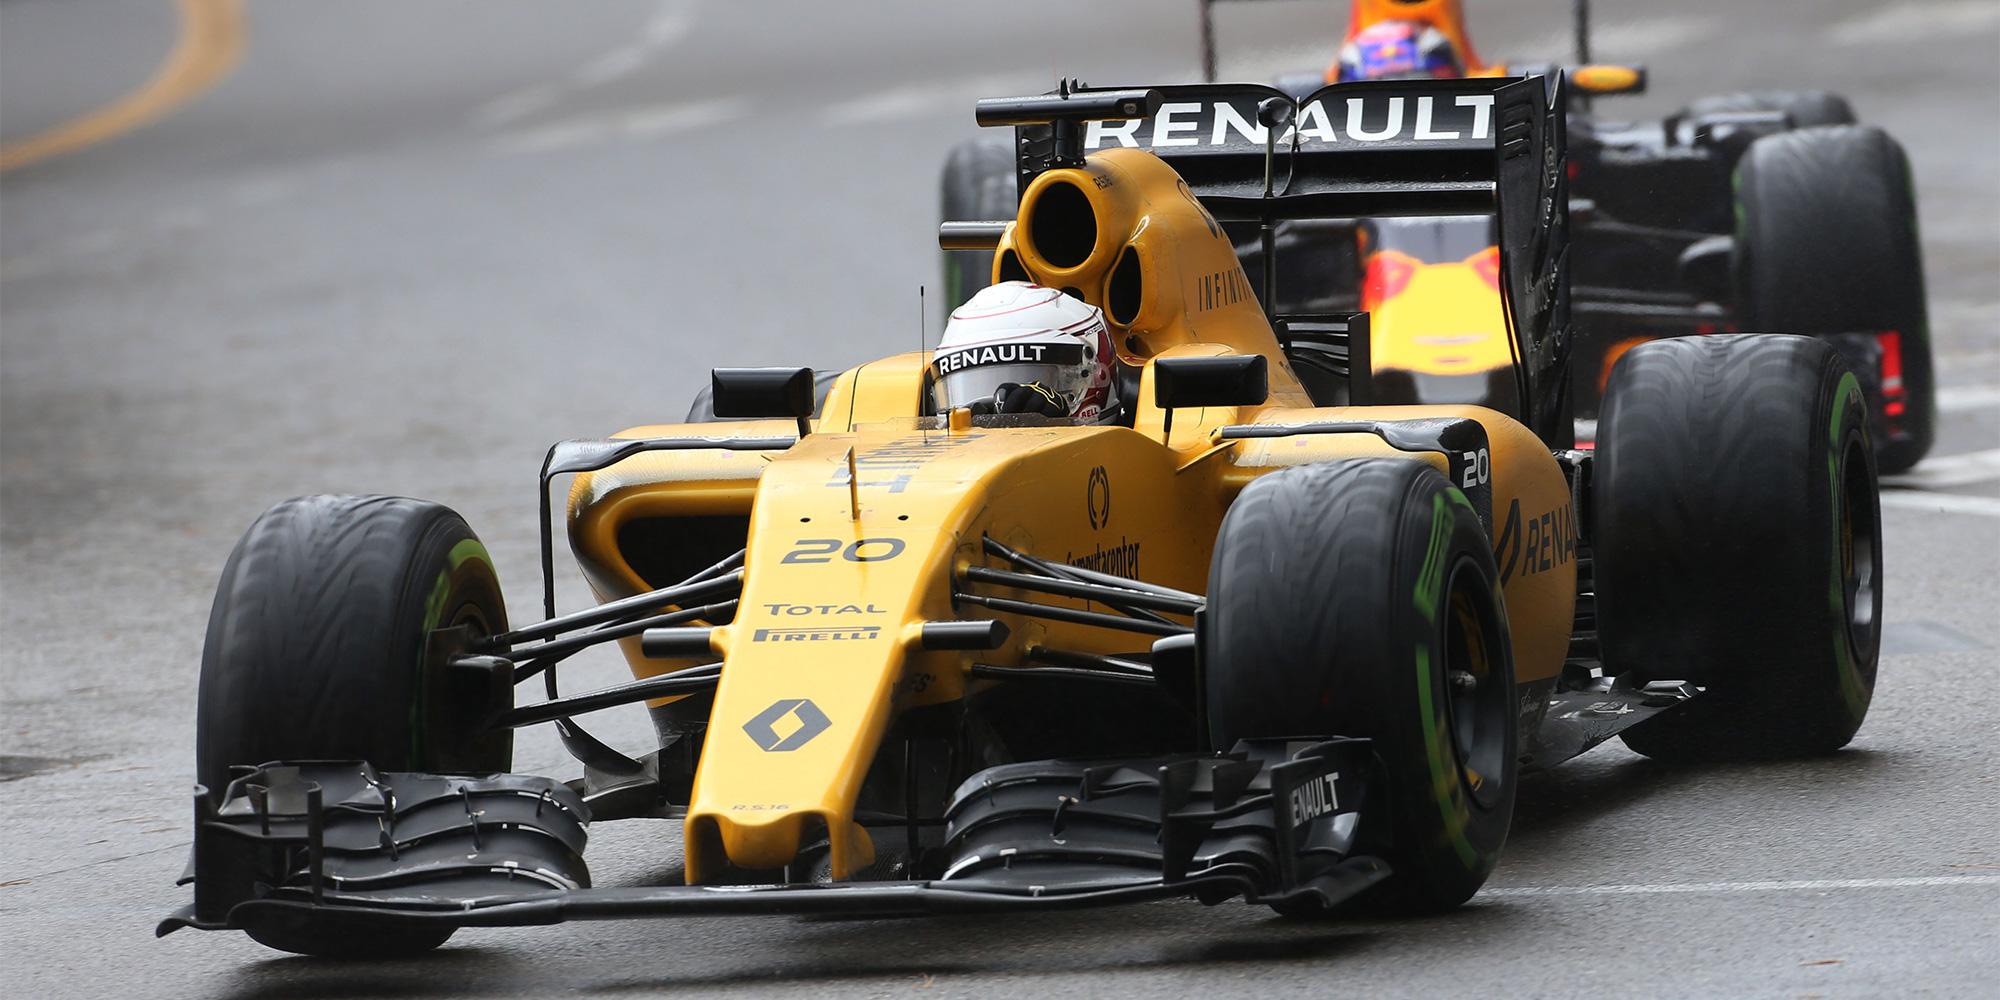 Kevin Magnussen, Formel 1, GP Monaco, 2016